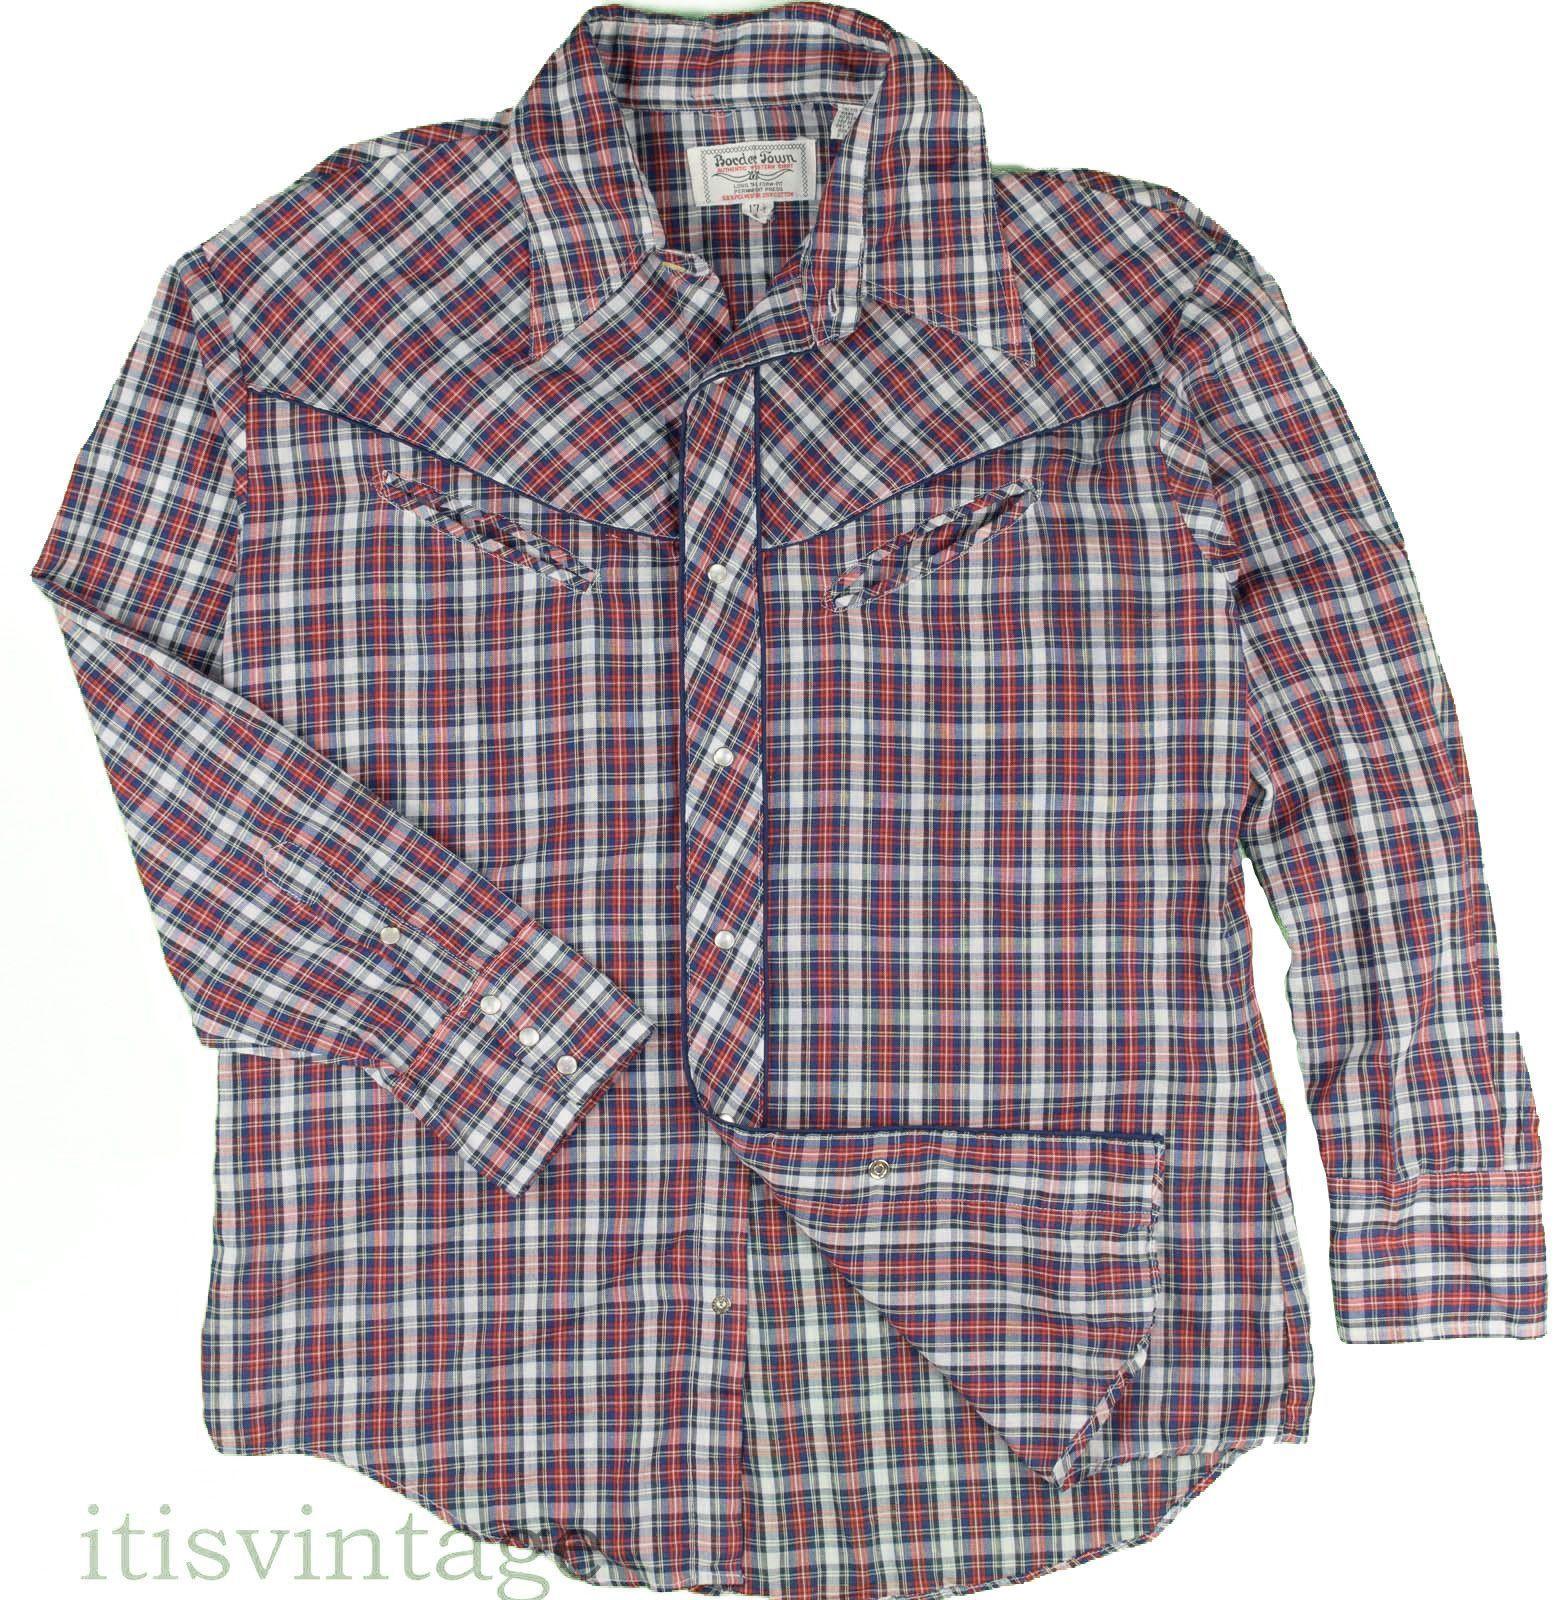 8830b13d Border Town Shirt Vintage Western Wear Pearl Snap Smiley Pockets Plaid 17 1/ 2